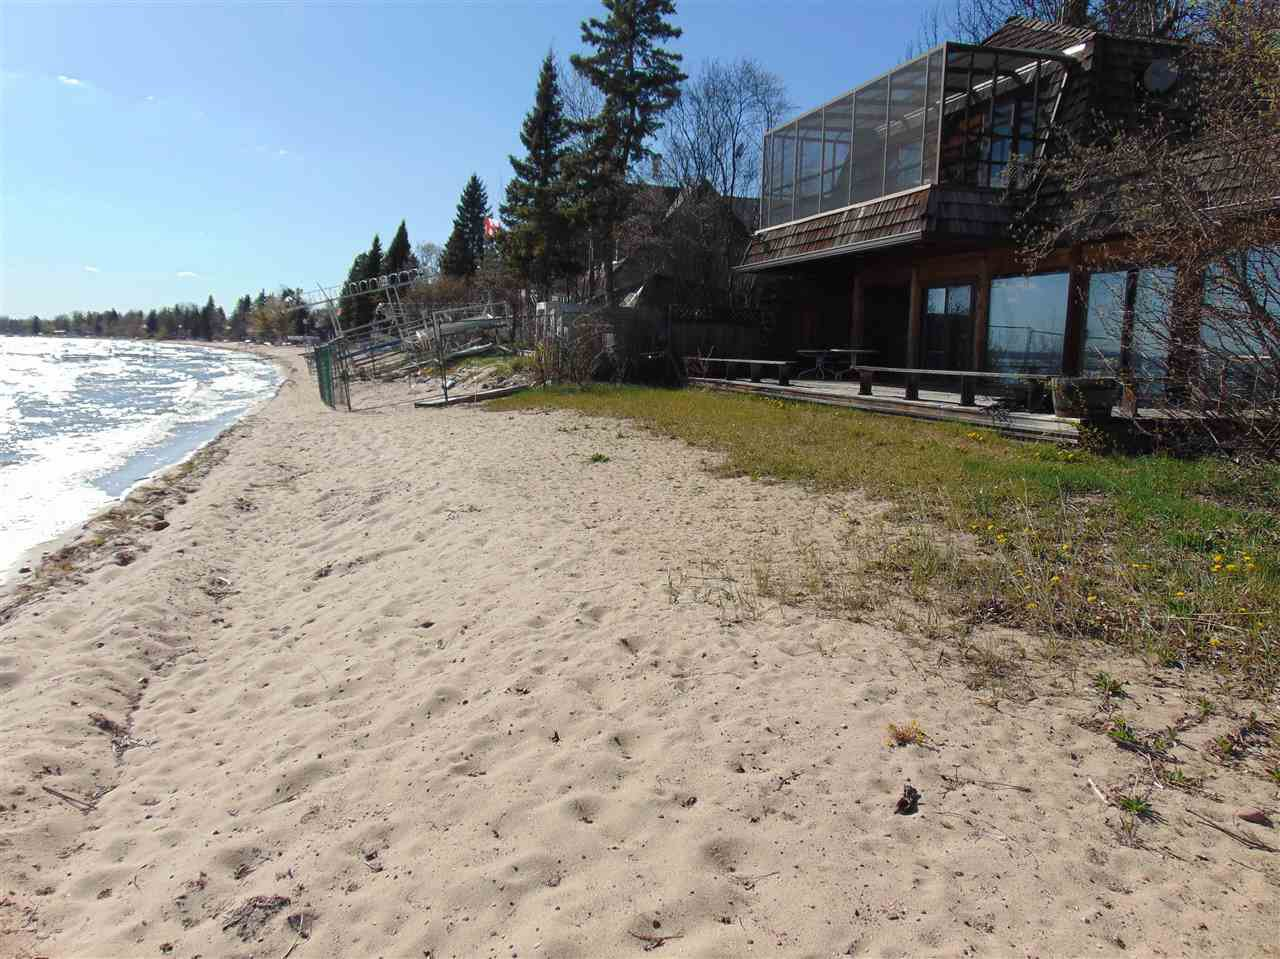 Main Photo: 12A Argentia Beach: Rural Wetaskiwin County Rural Land/Vacant Lot for sale : MLS®# E4183242